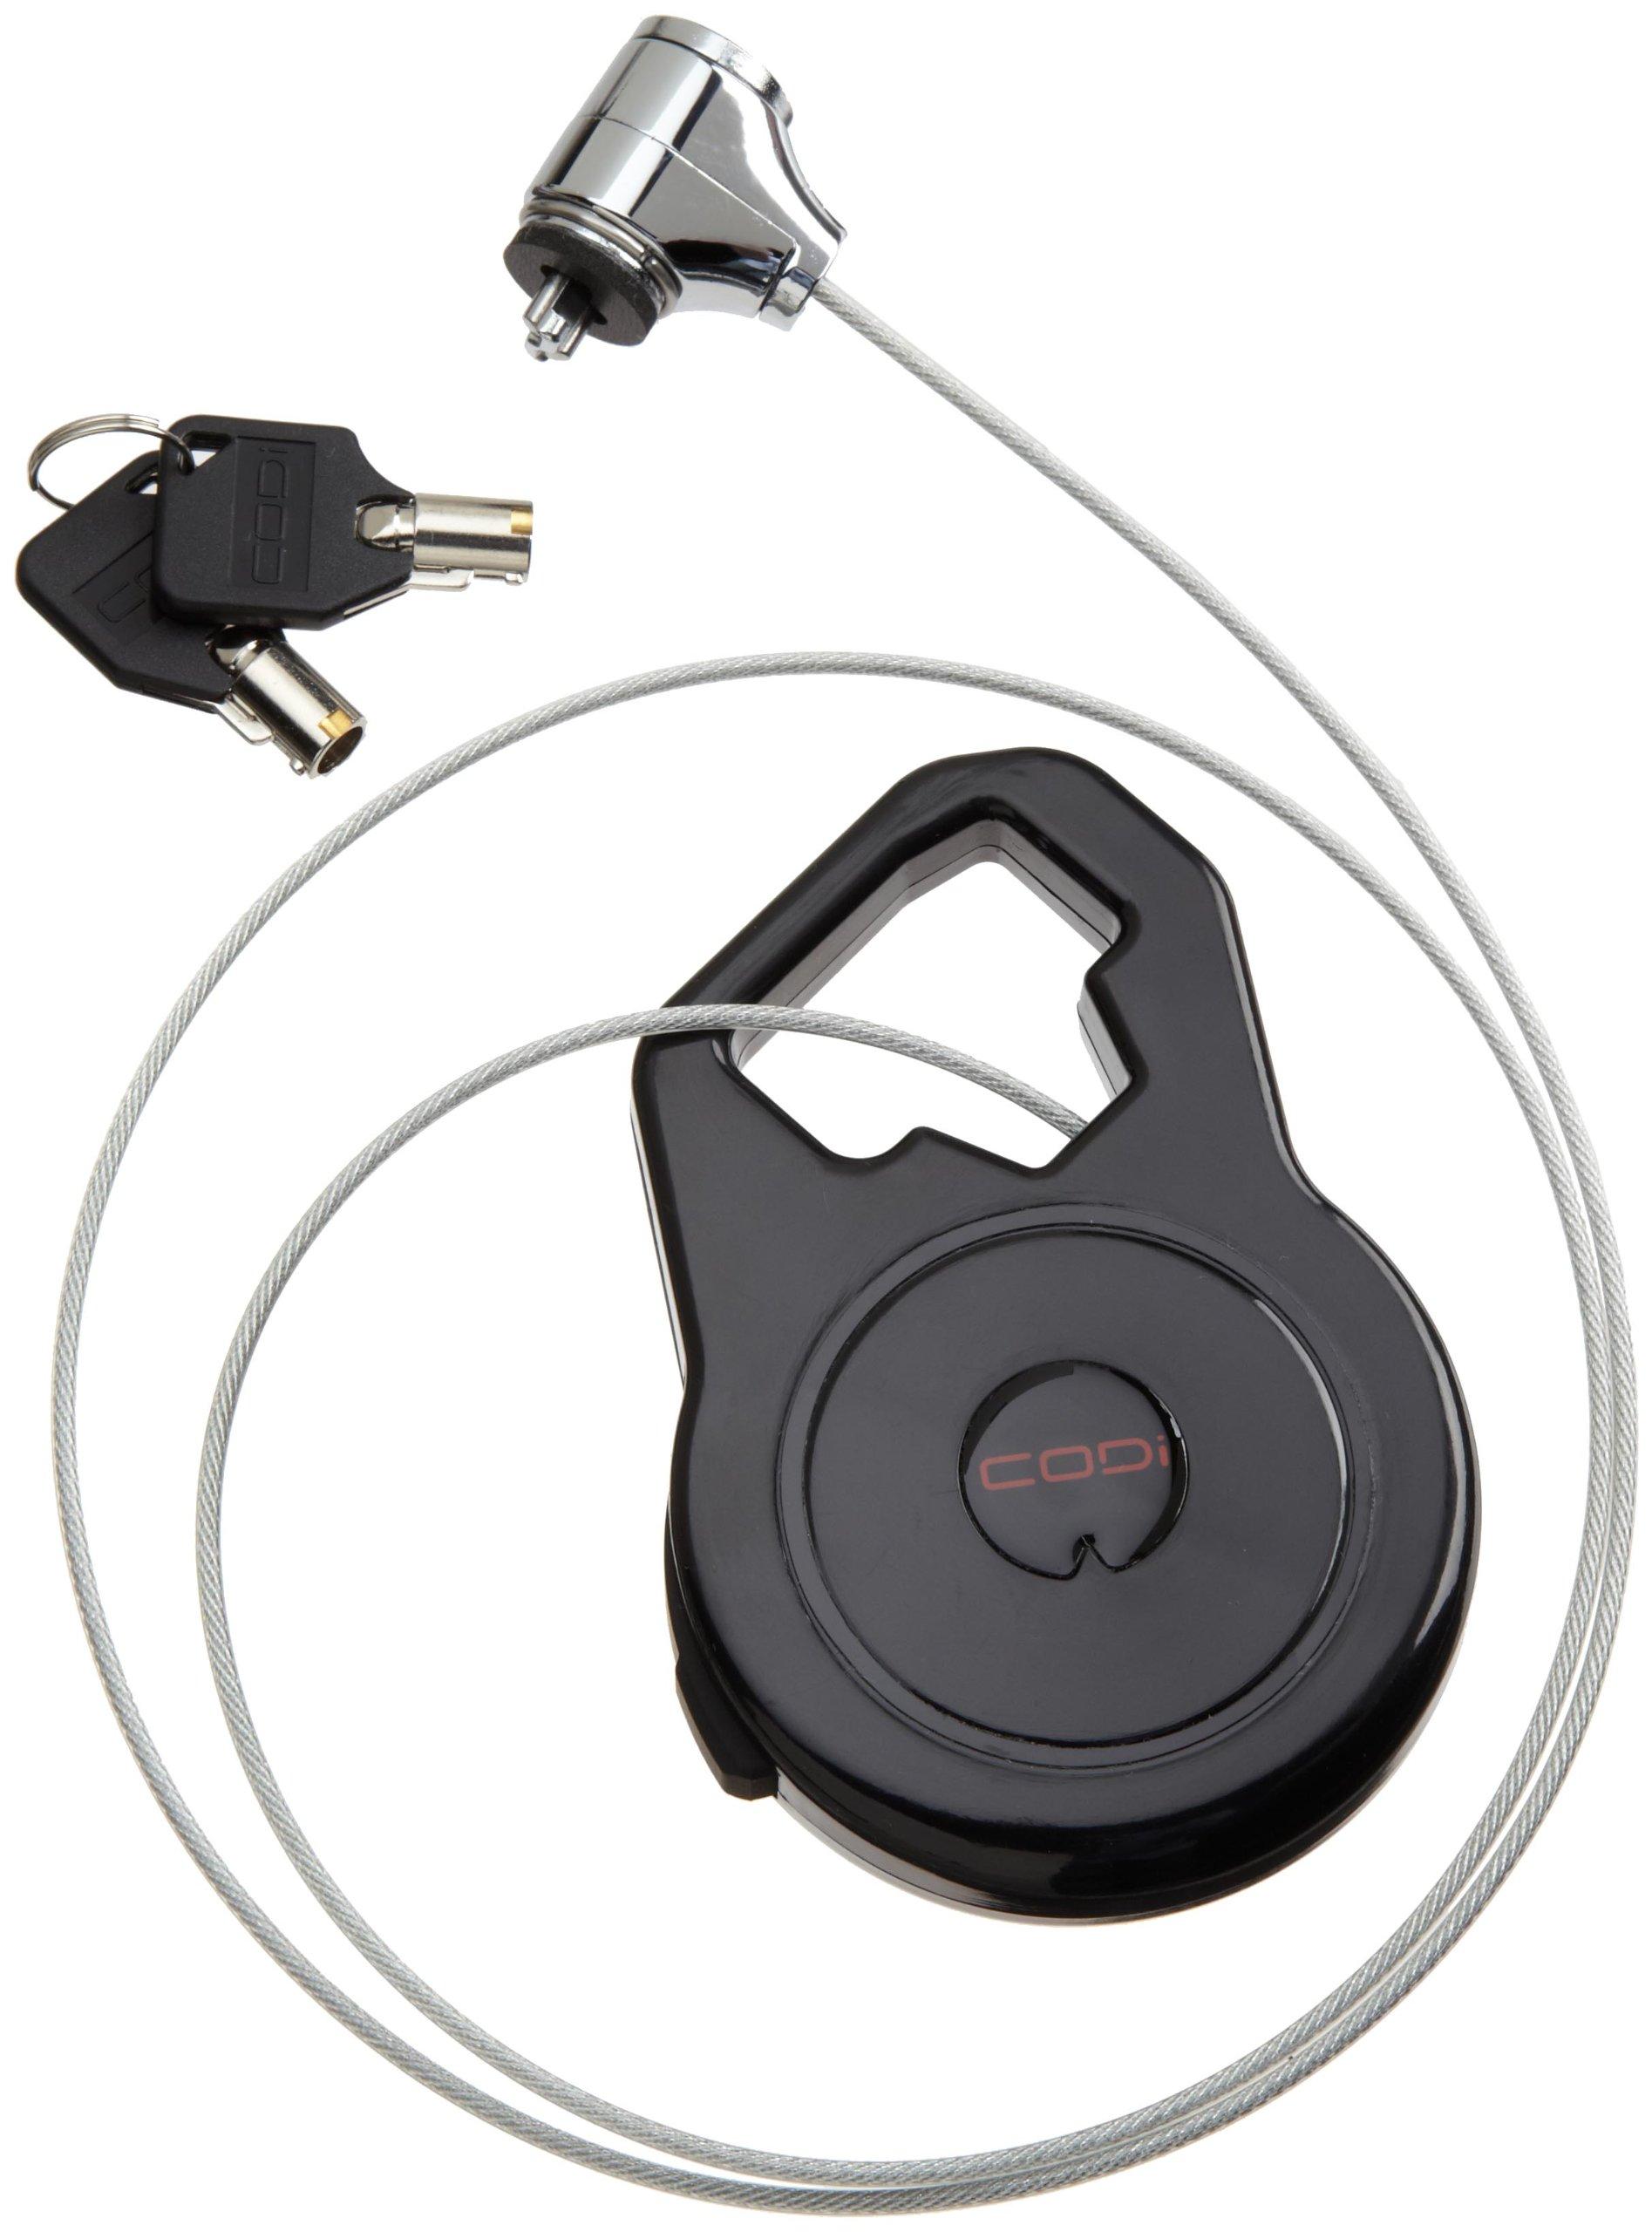 CODi Retractable Key Cable Lock